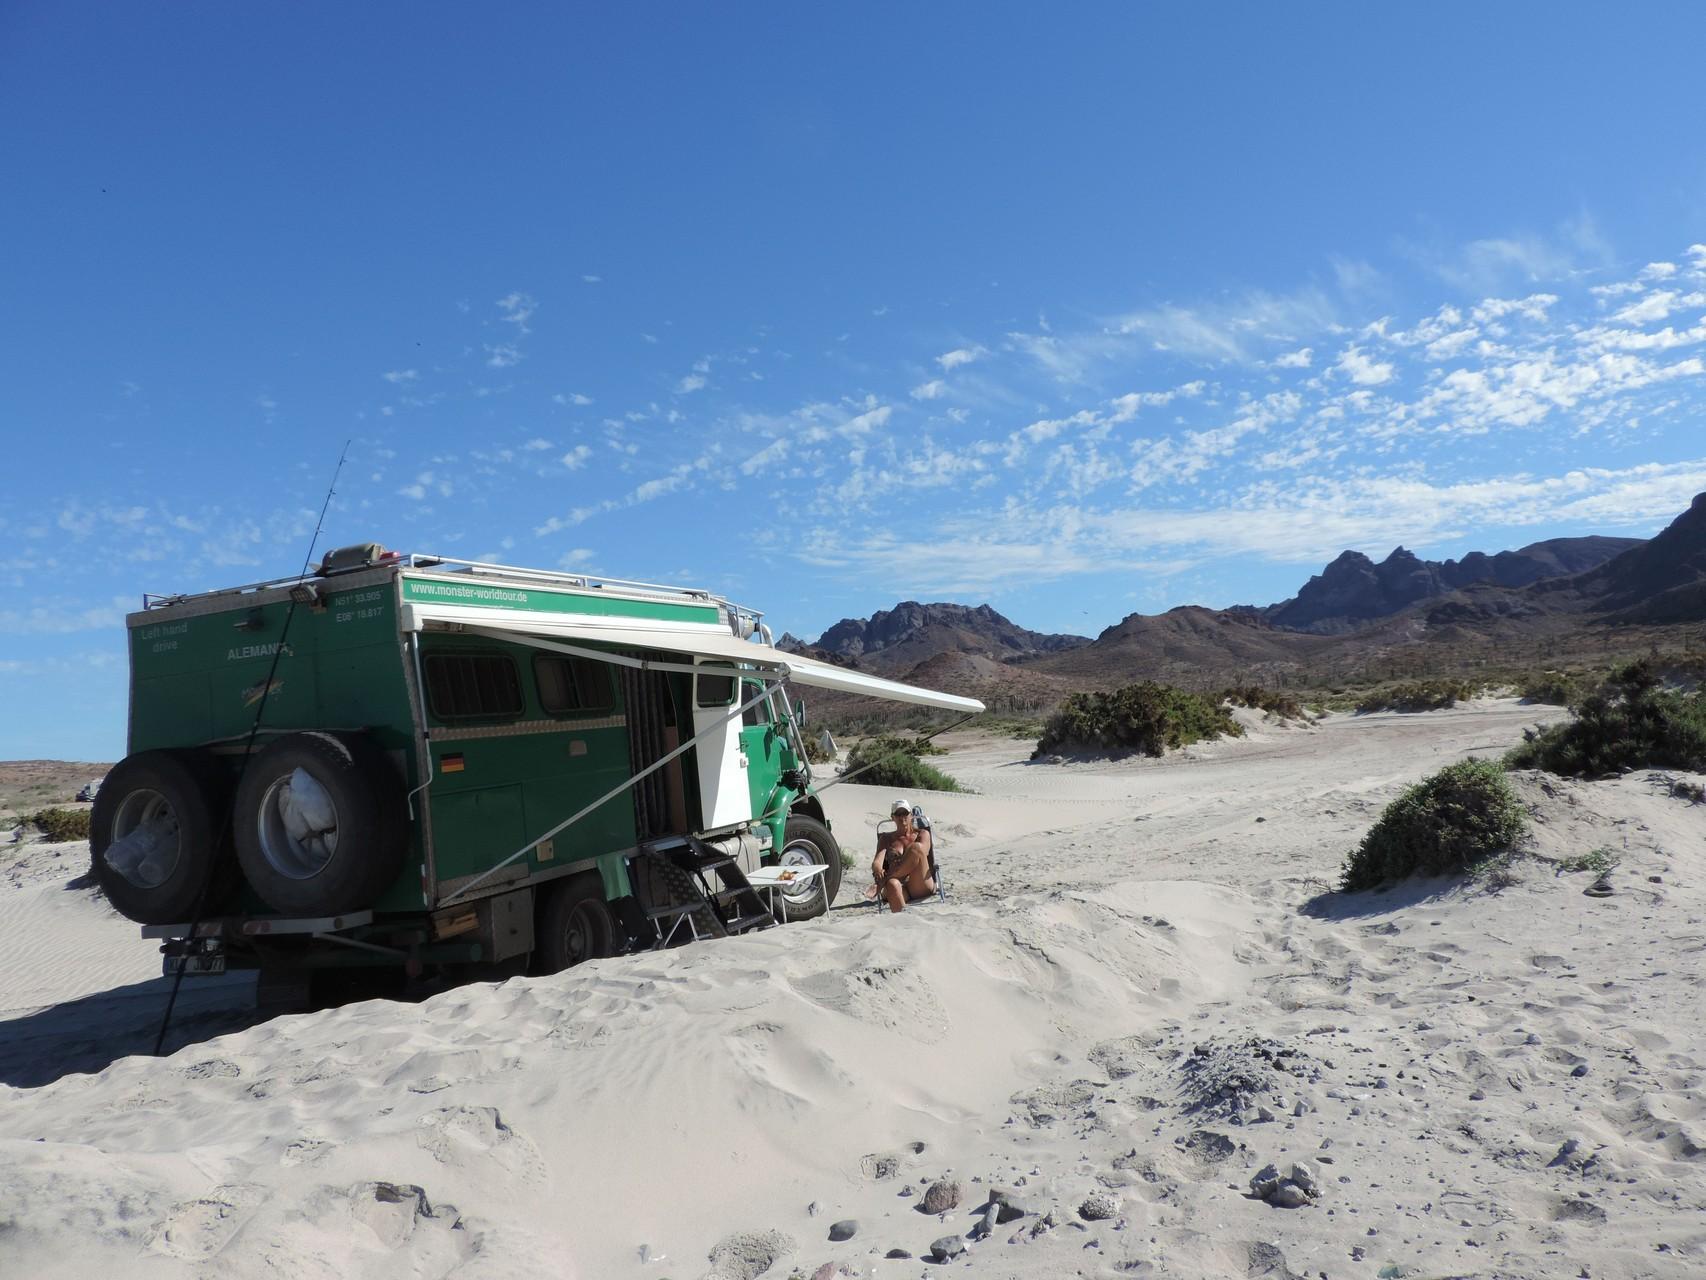 Strandleben am Playa Tecolote